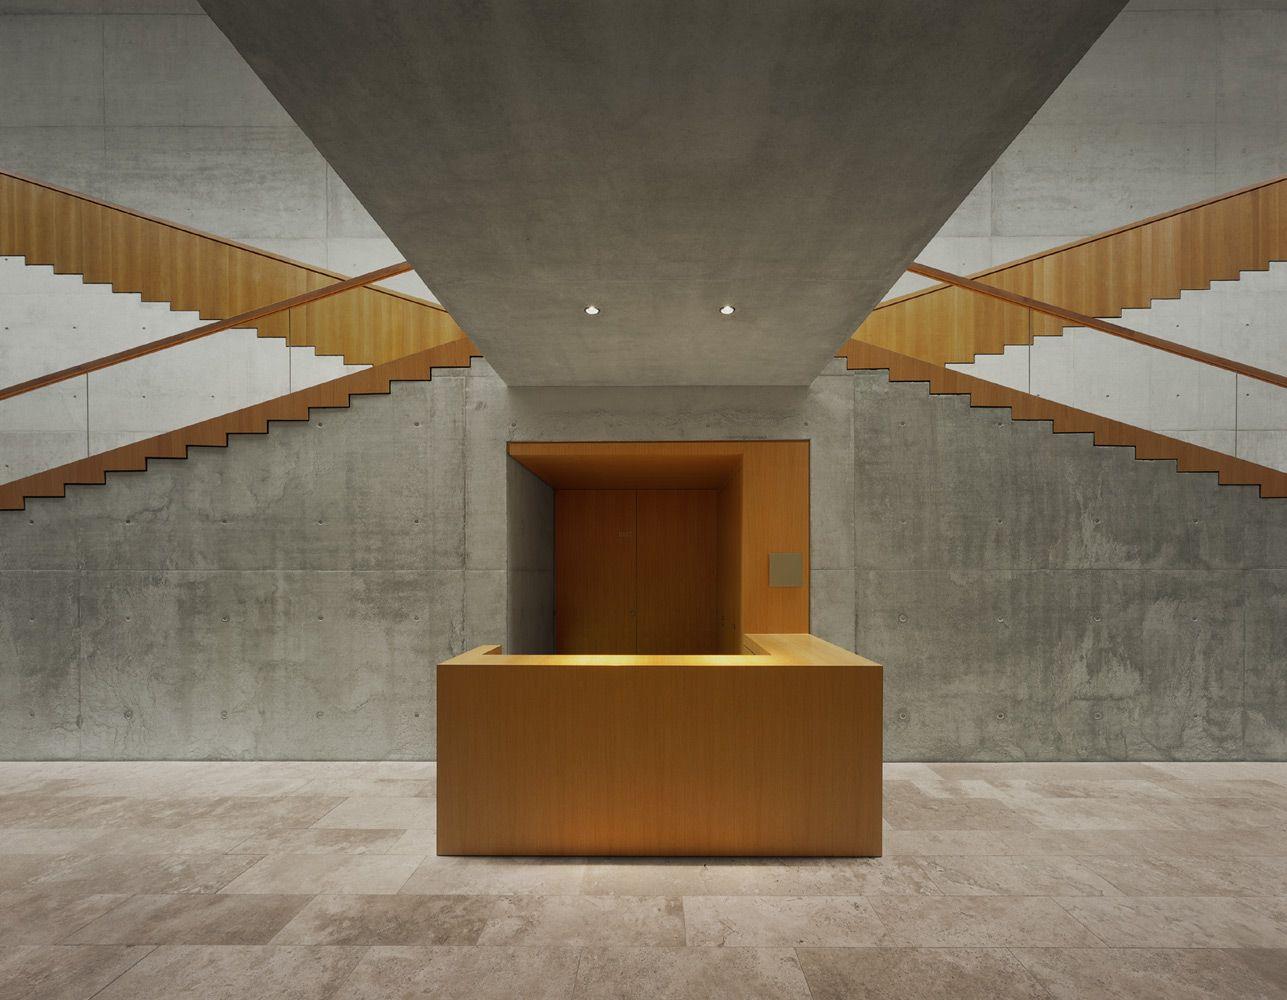 Architekten Schweinfurt staircase with beautiful minimal detailling interior of the